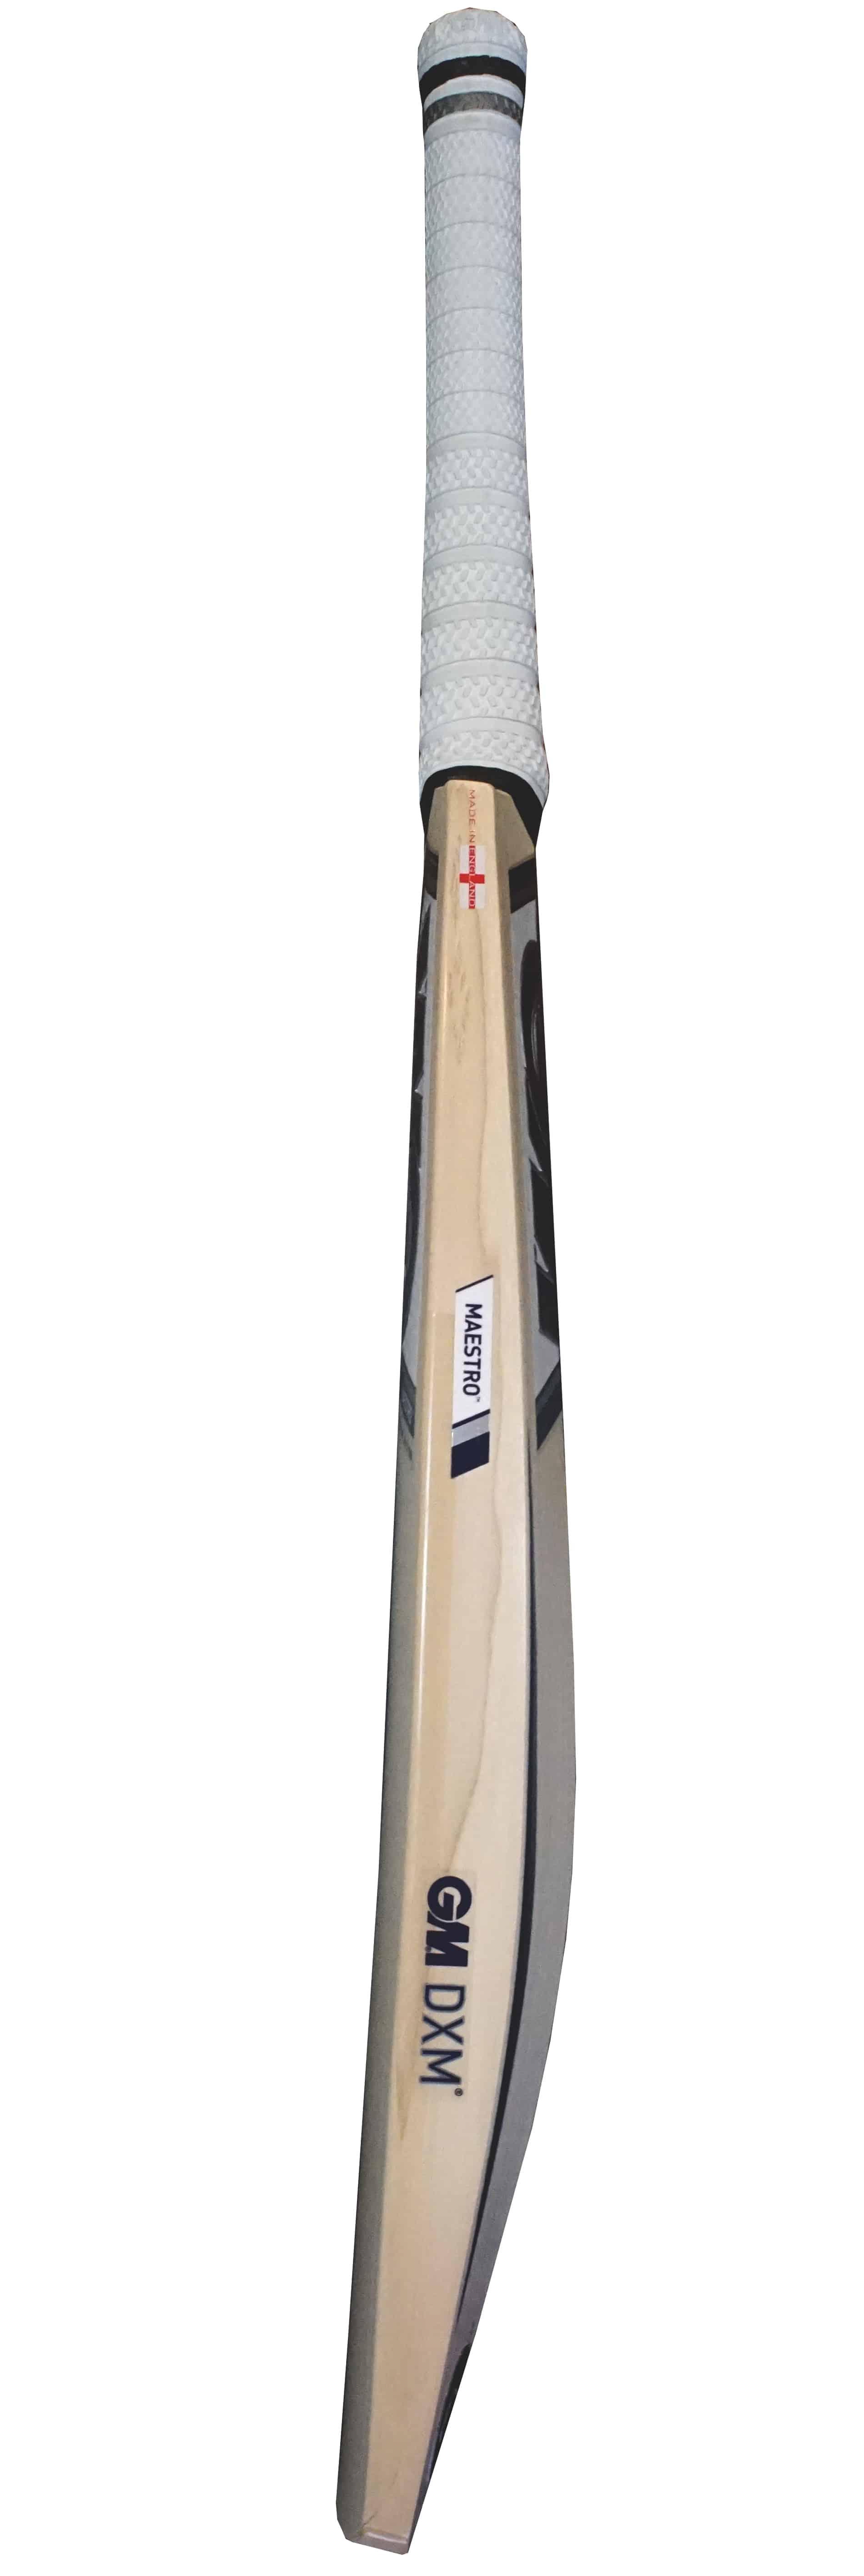 Maestro Pro LE GM Cricket Bat